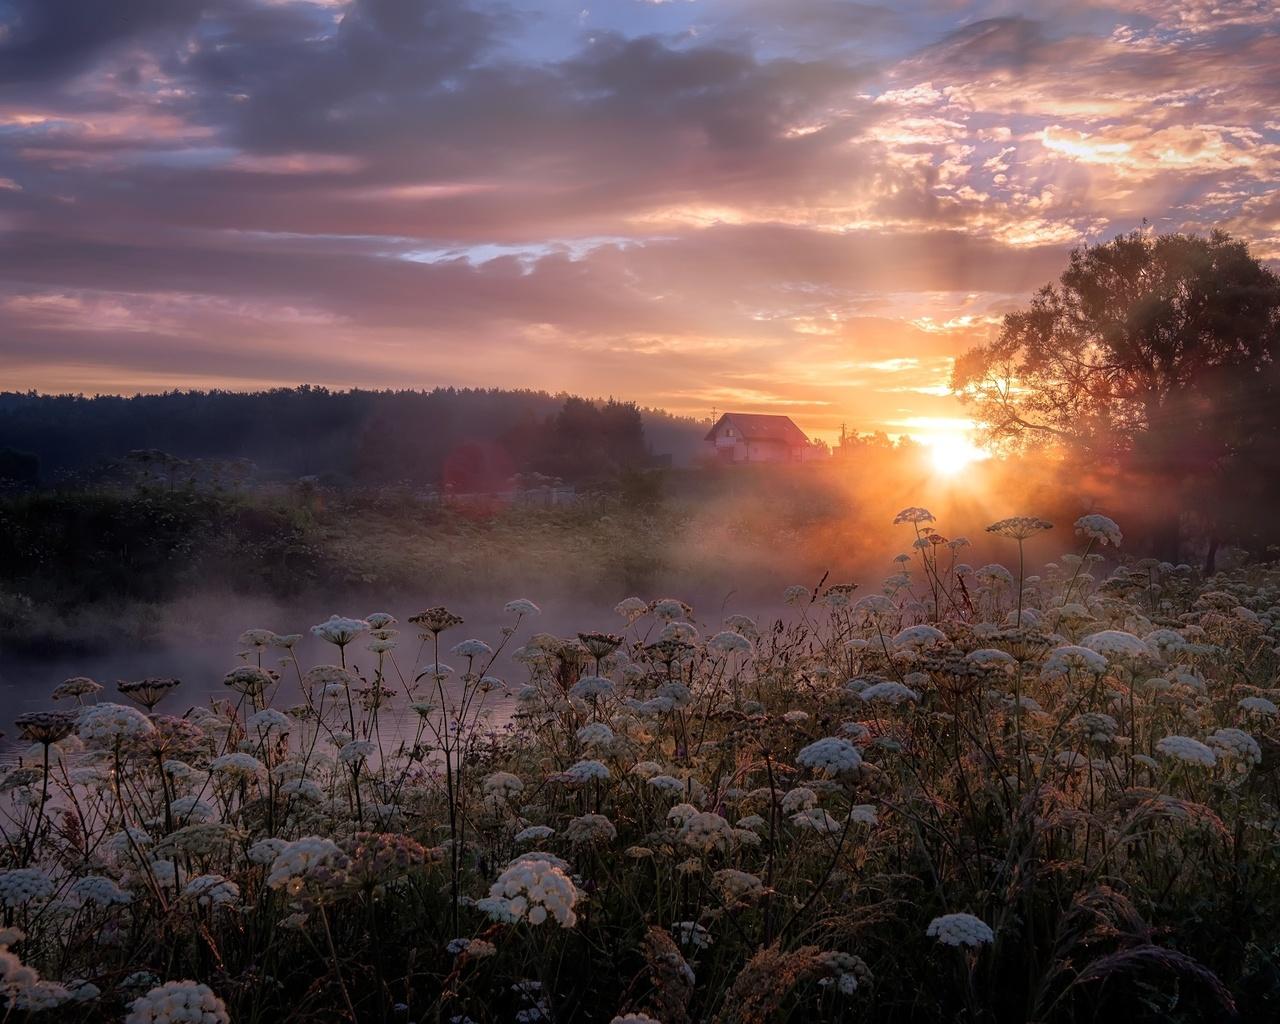 природа, пейзаж, речушка, берега, травы, лес, дерево, рассвет, утро, туман